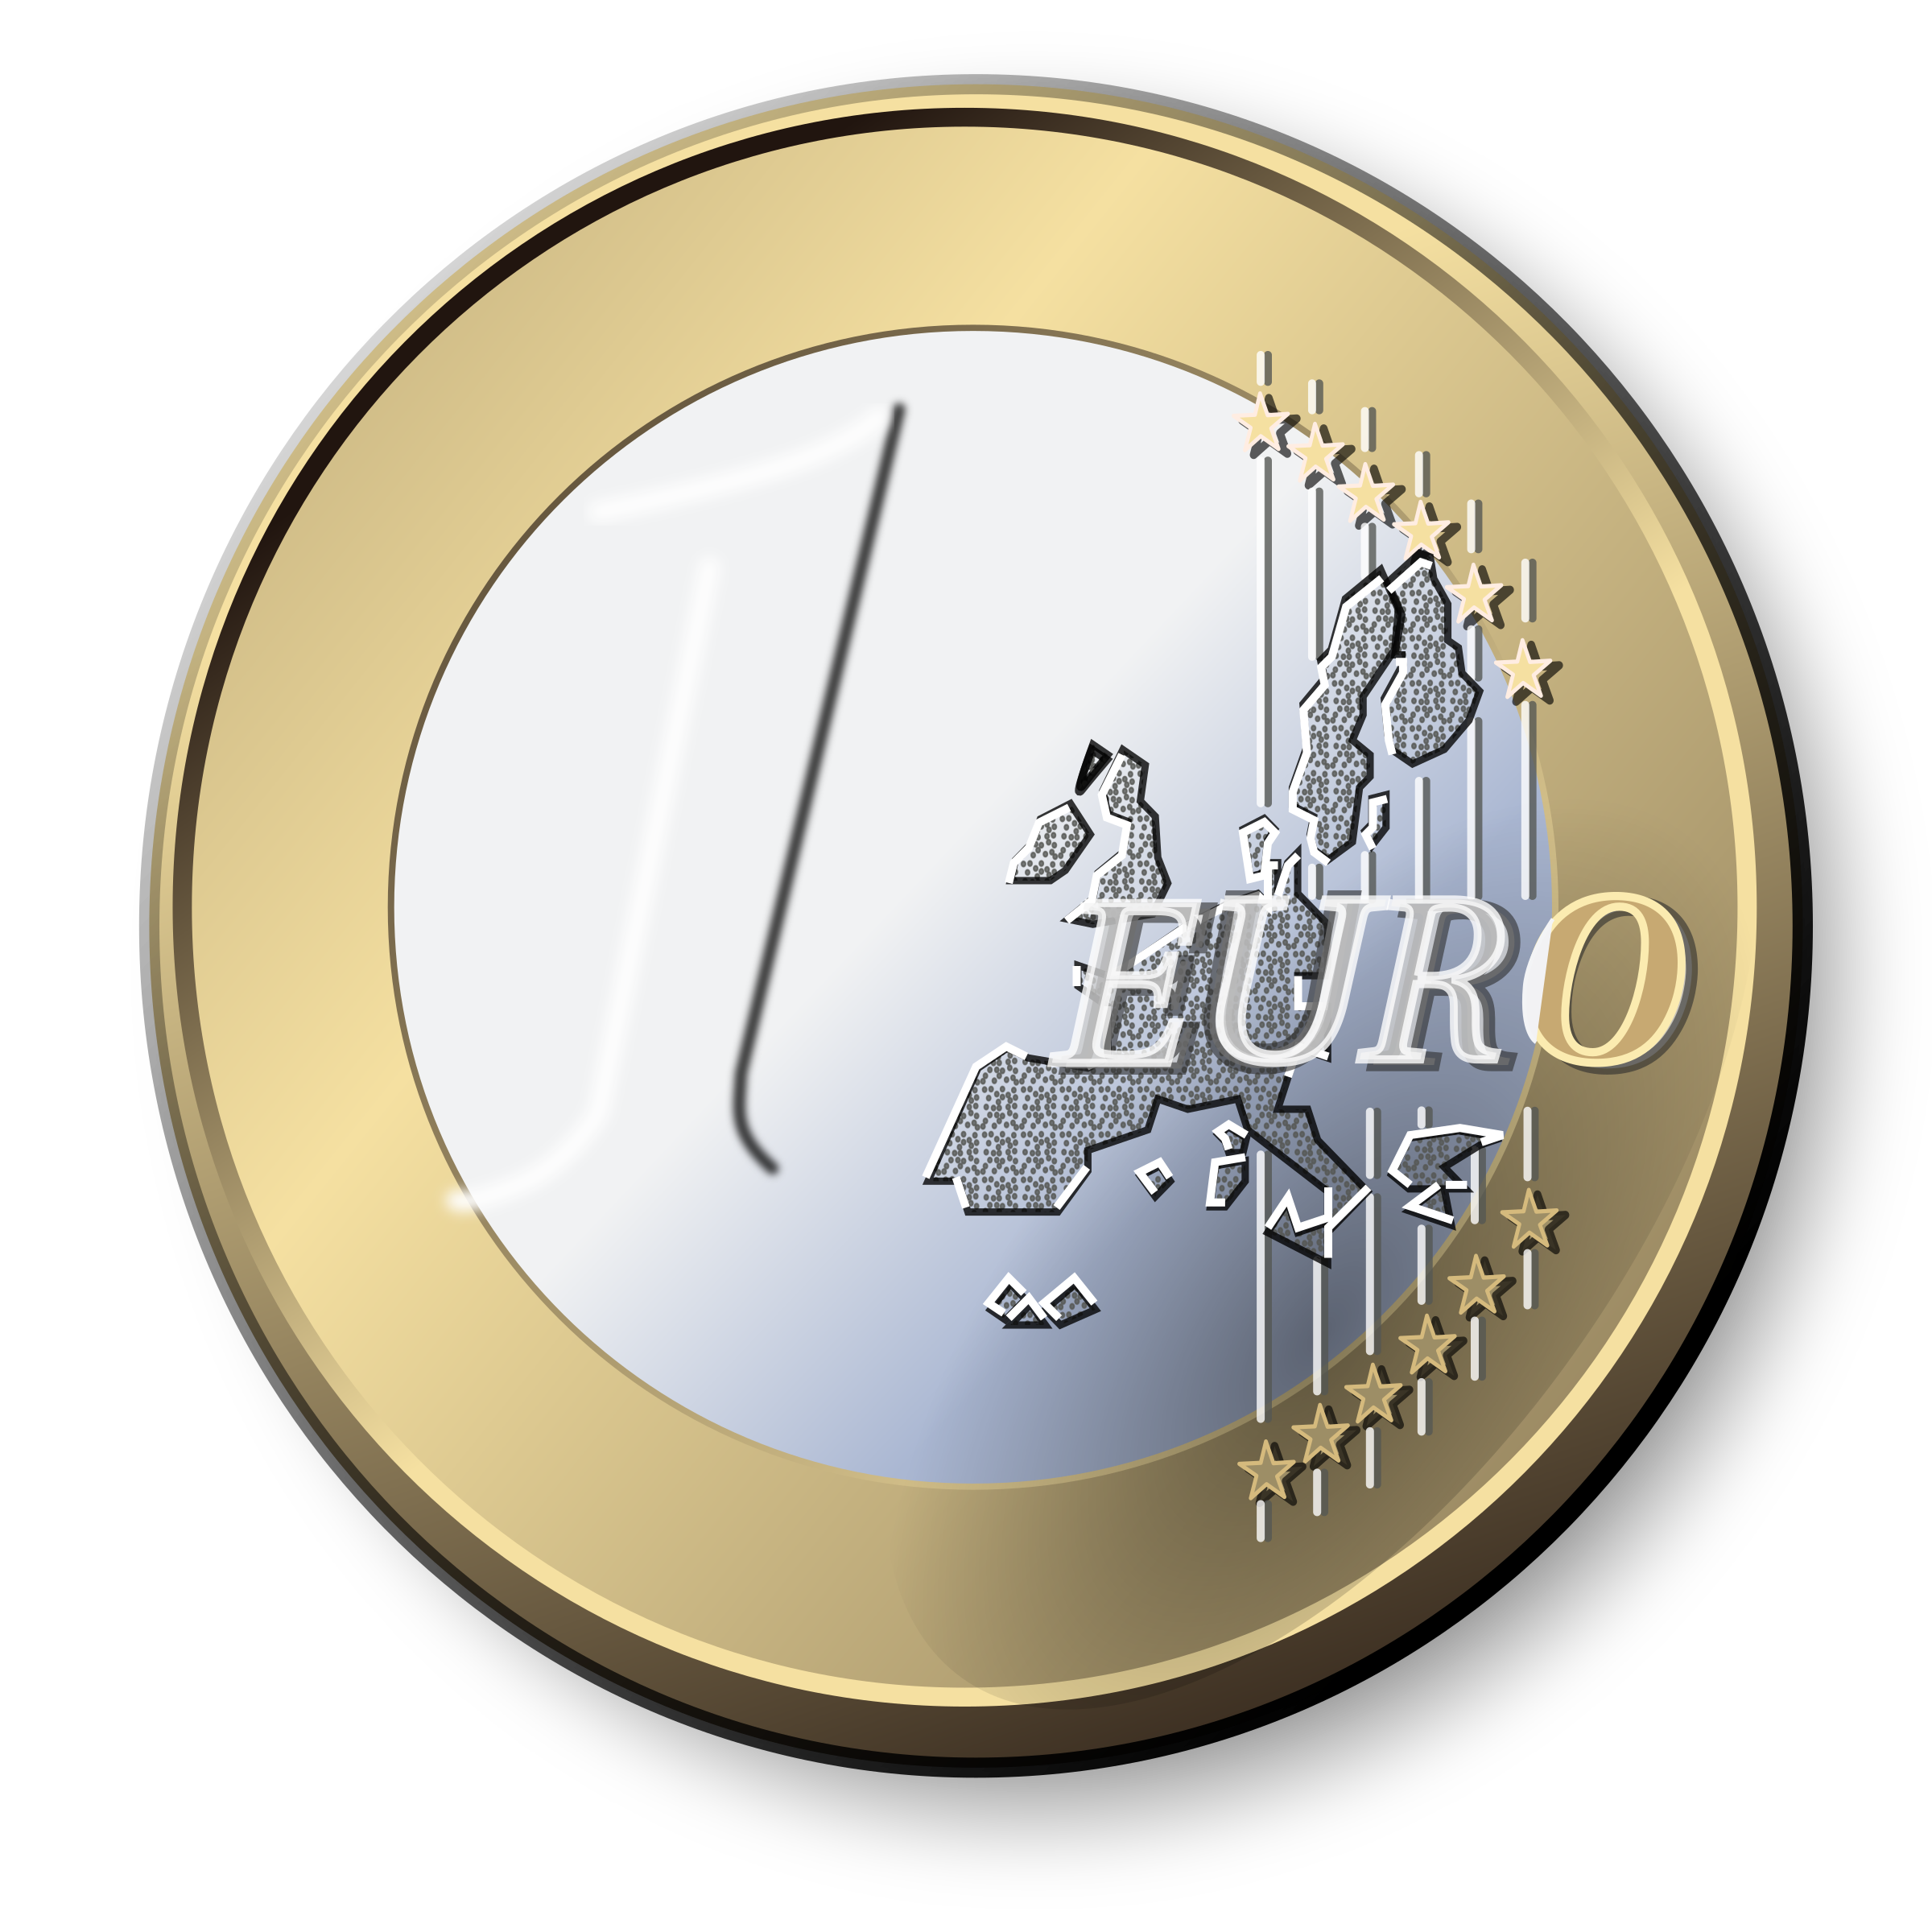 Coin clipart one One Coin Coin Clipart Euro